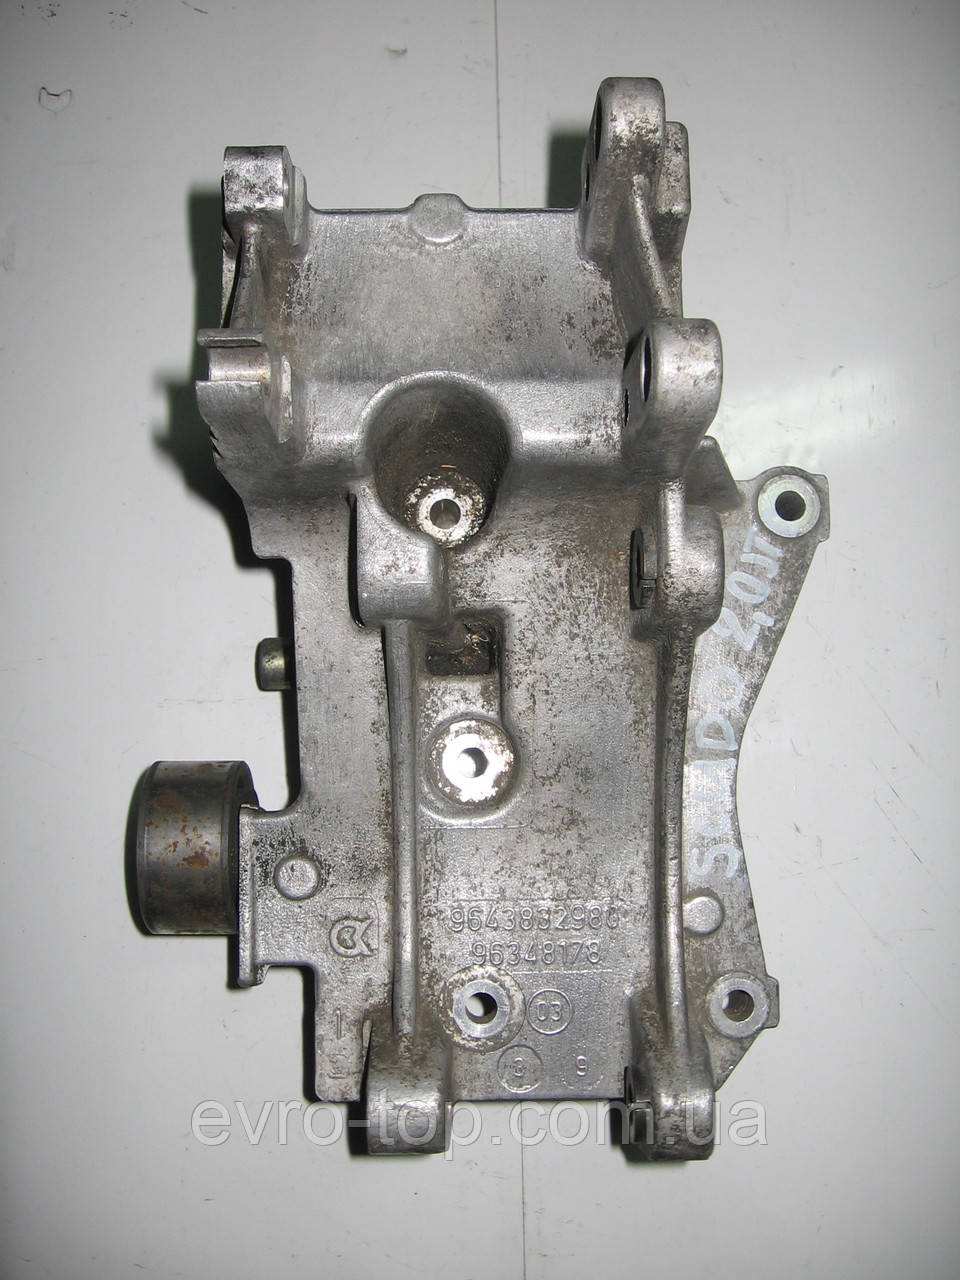 Кронштейн генератора 9643832980 б/у на Fiat Scudo, Citroen Jumper, Peugeot Expert 2.0jtd год 1995-2007